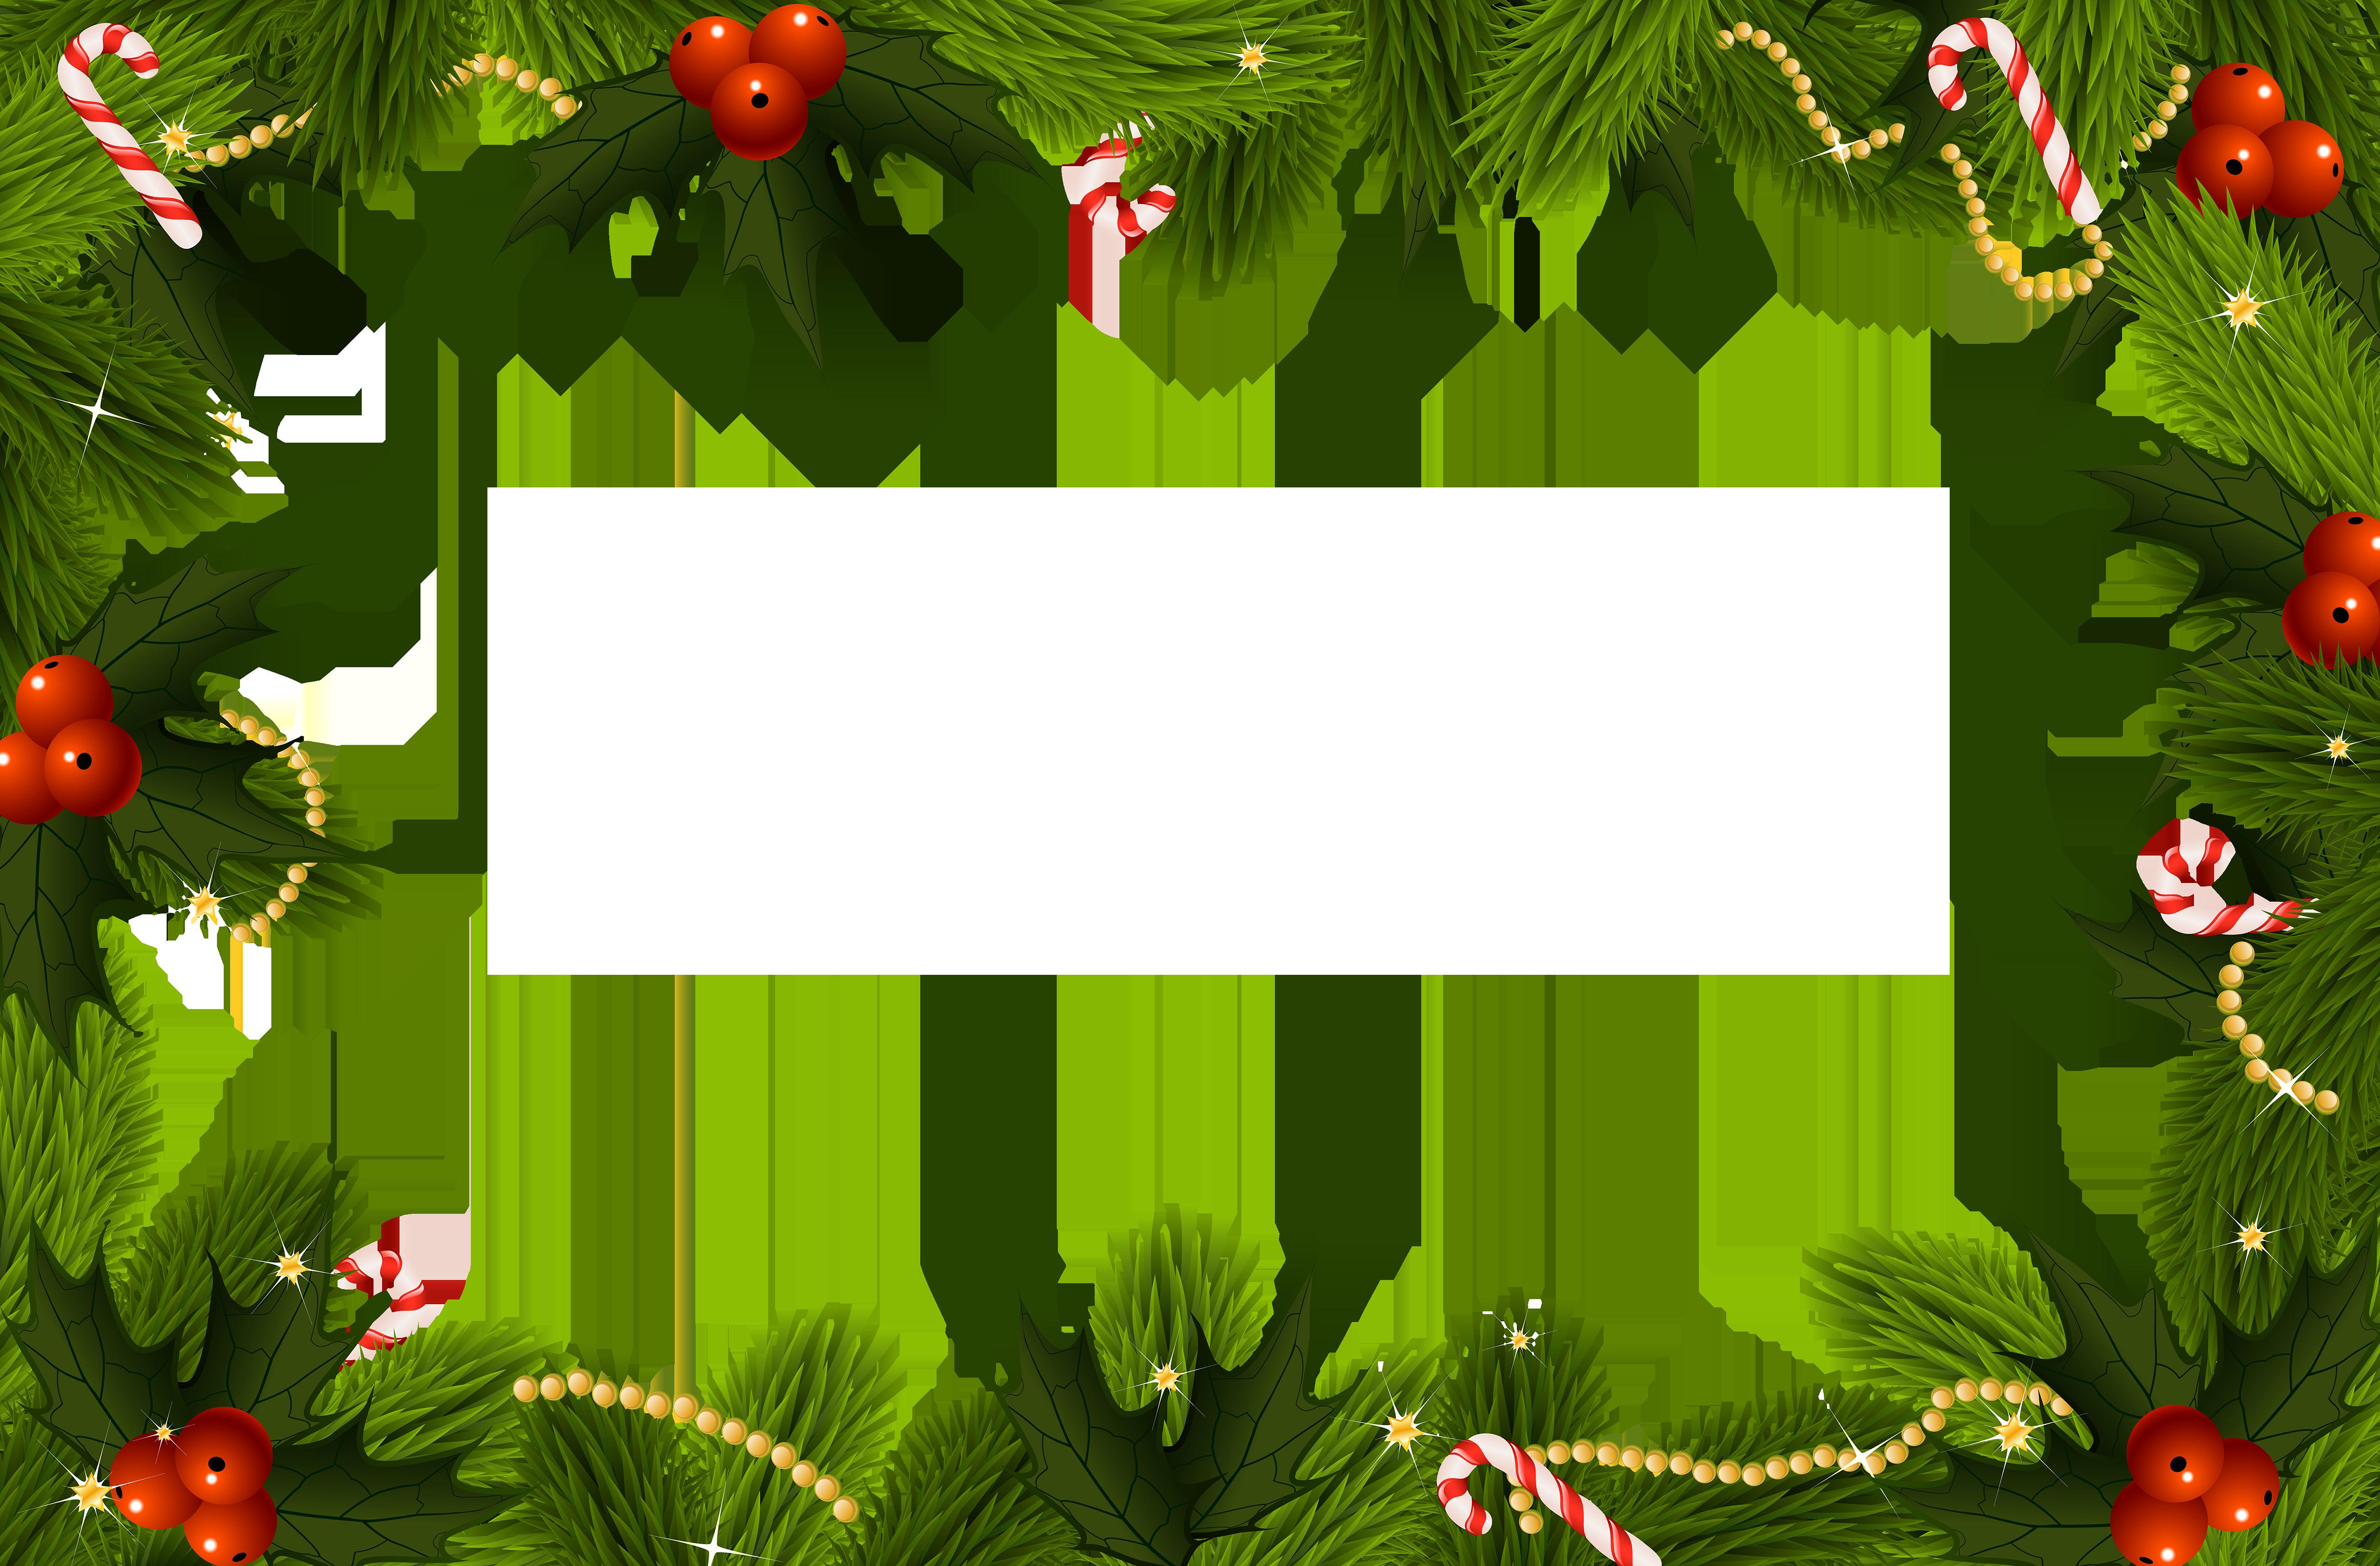 Christmas transparent png border. Clipart frames tree